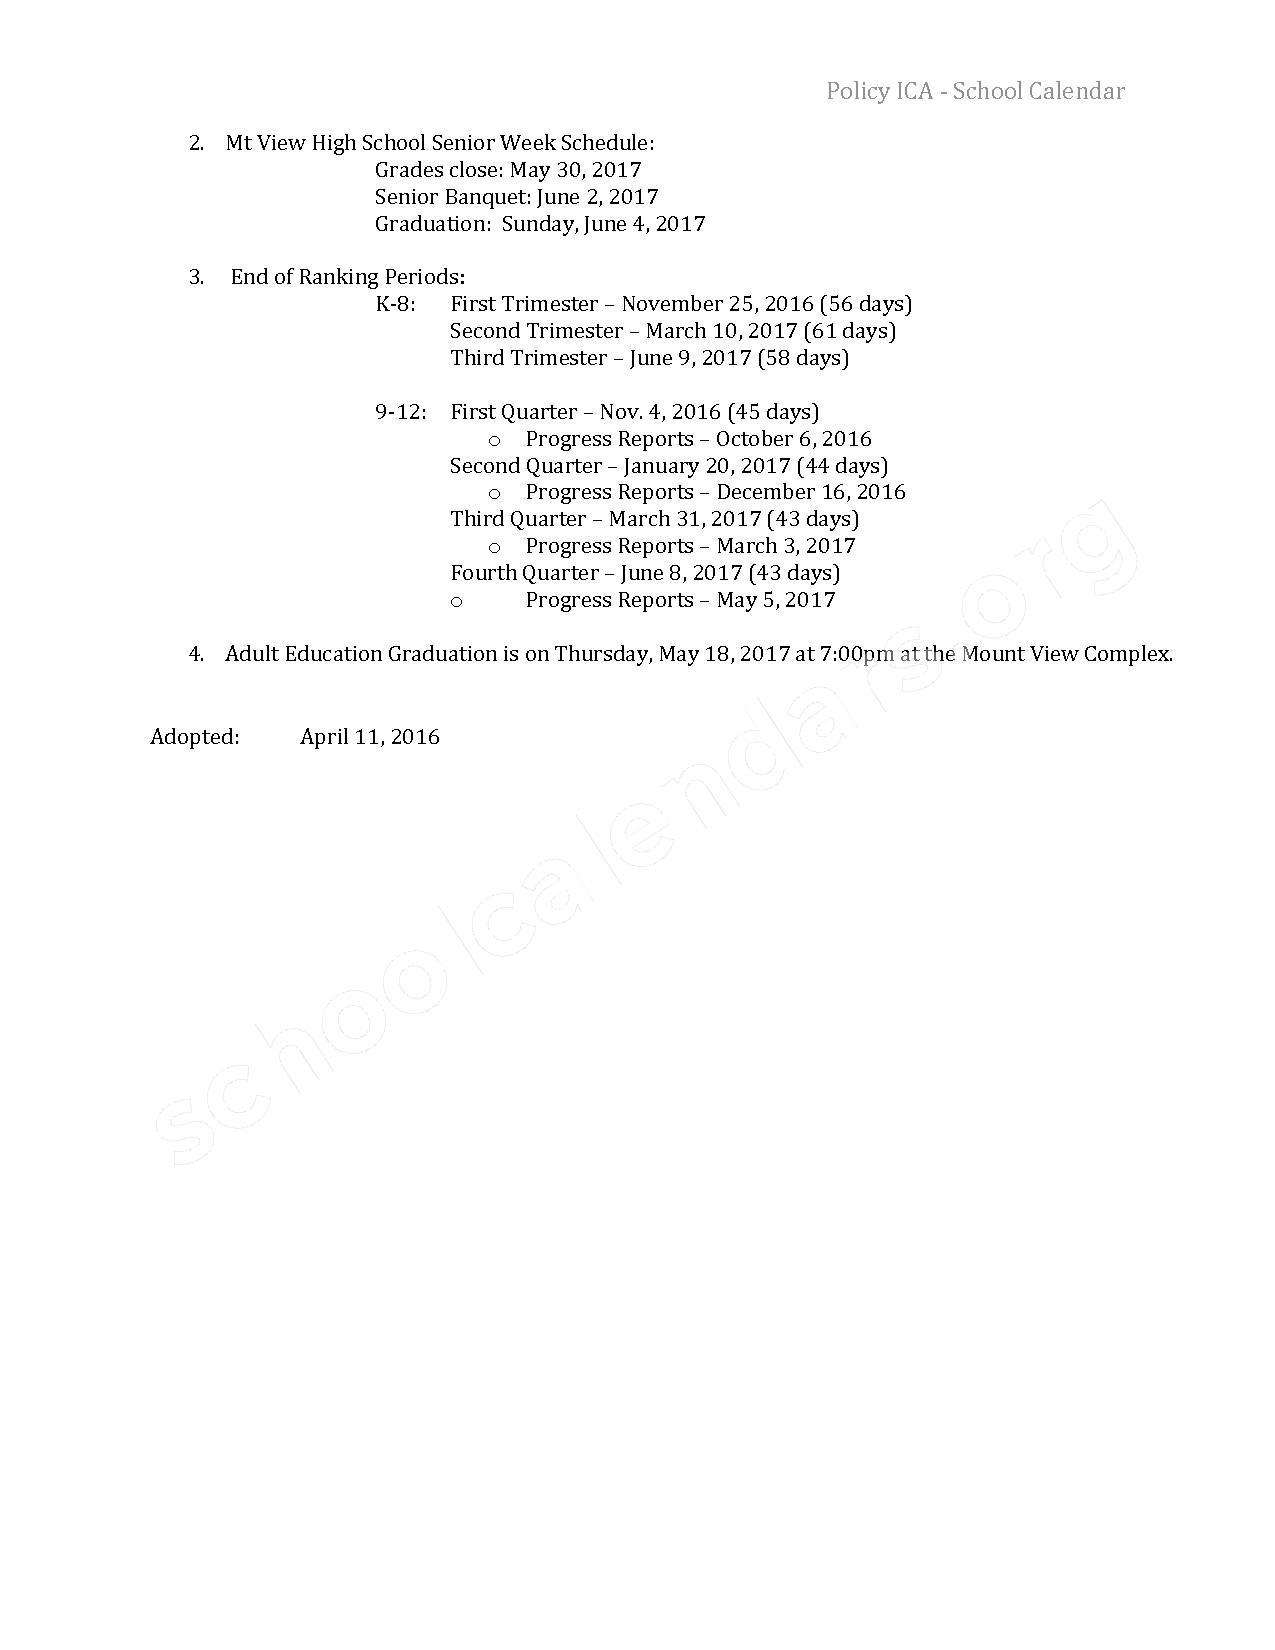 2016 - 2017 School Calendar – Mt View High School – page 2